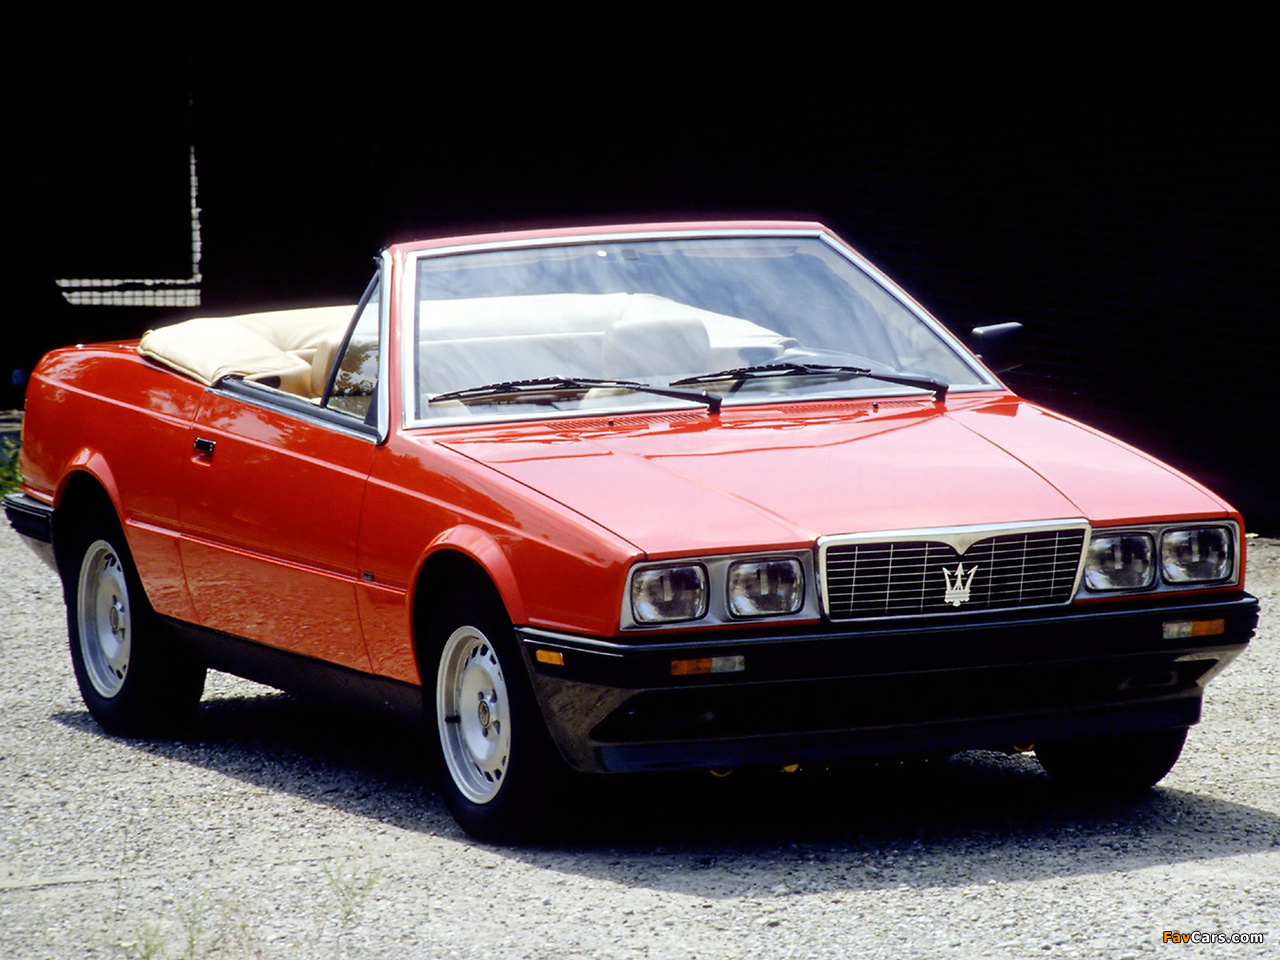 Maserati Biturbo Spyder 1989-91 pictures (1280x960)